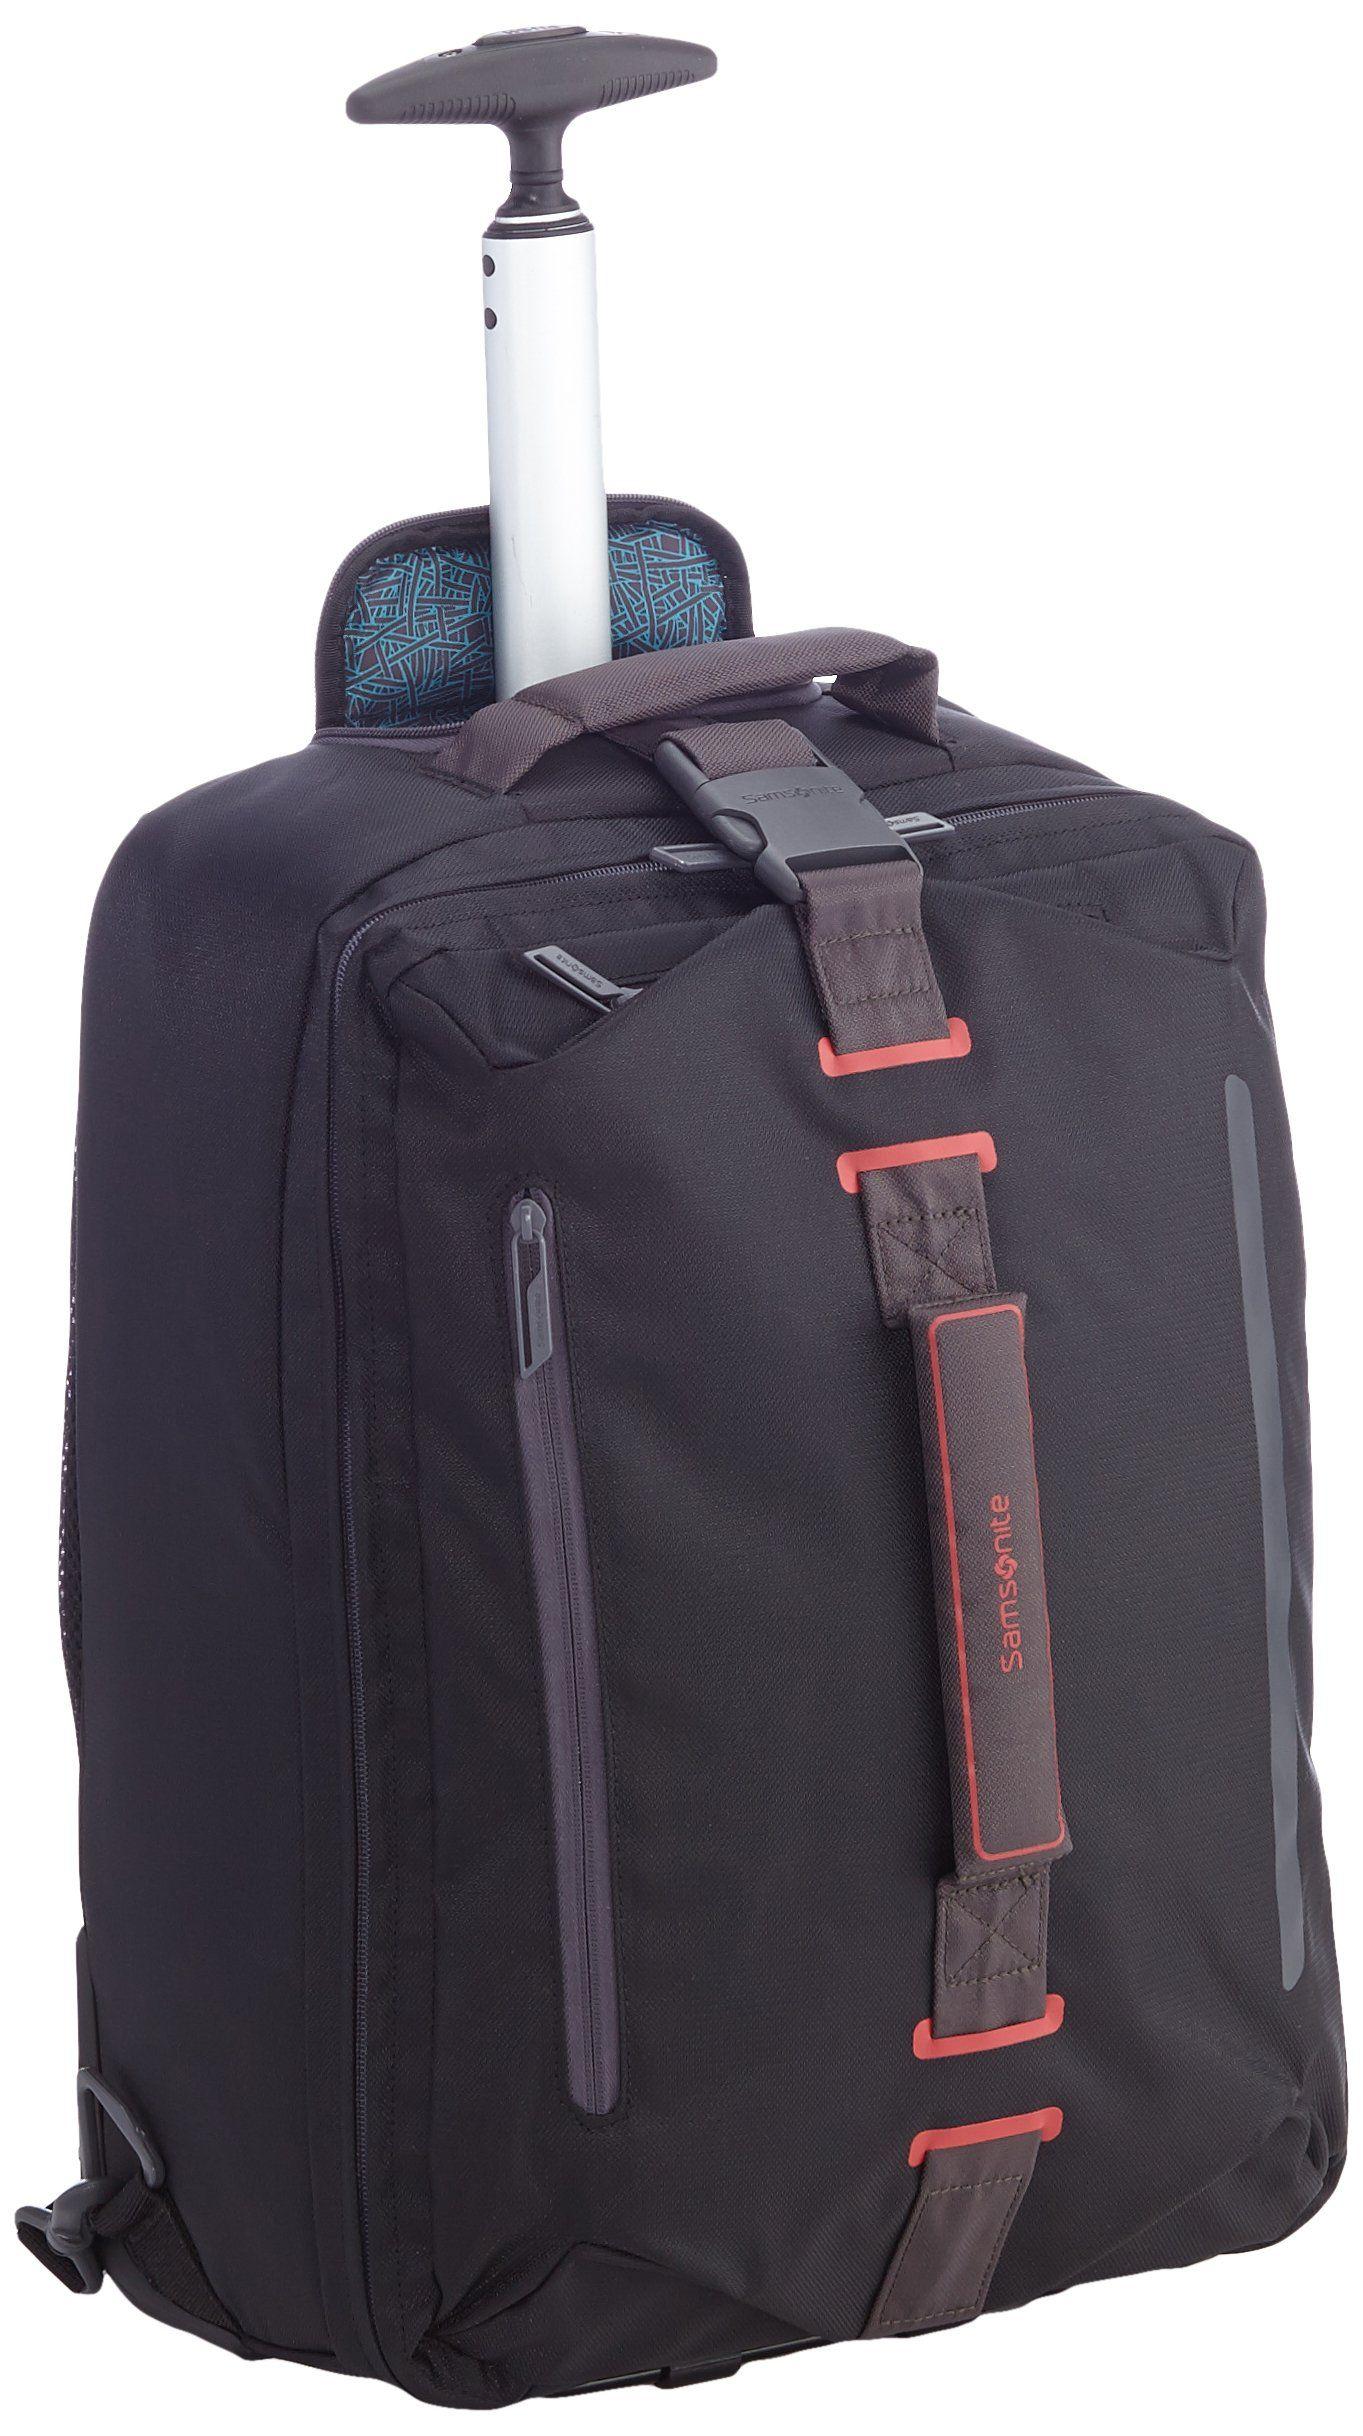 Samsonite Explorall Wh Laptop Rucksack 50cm 25 L